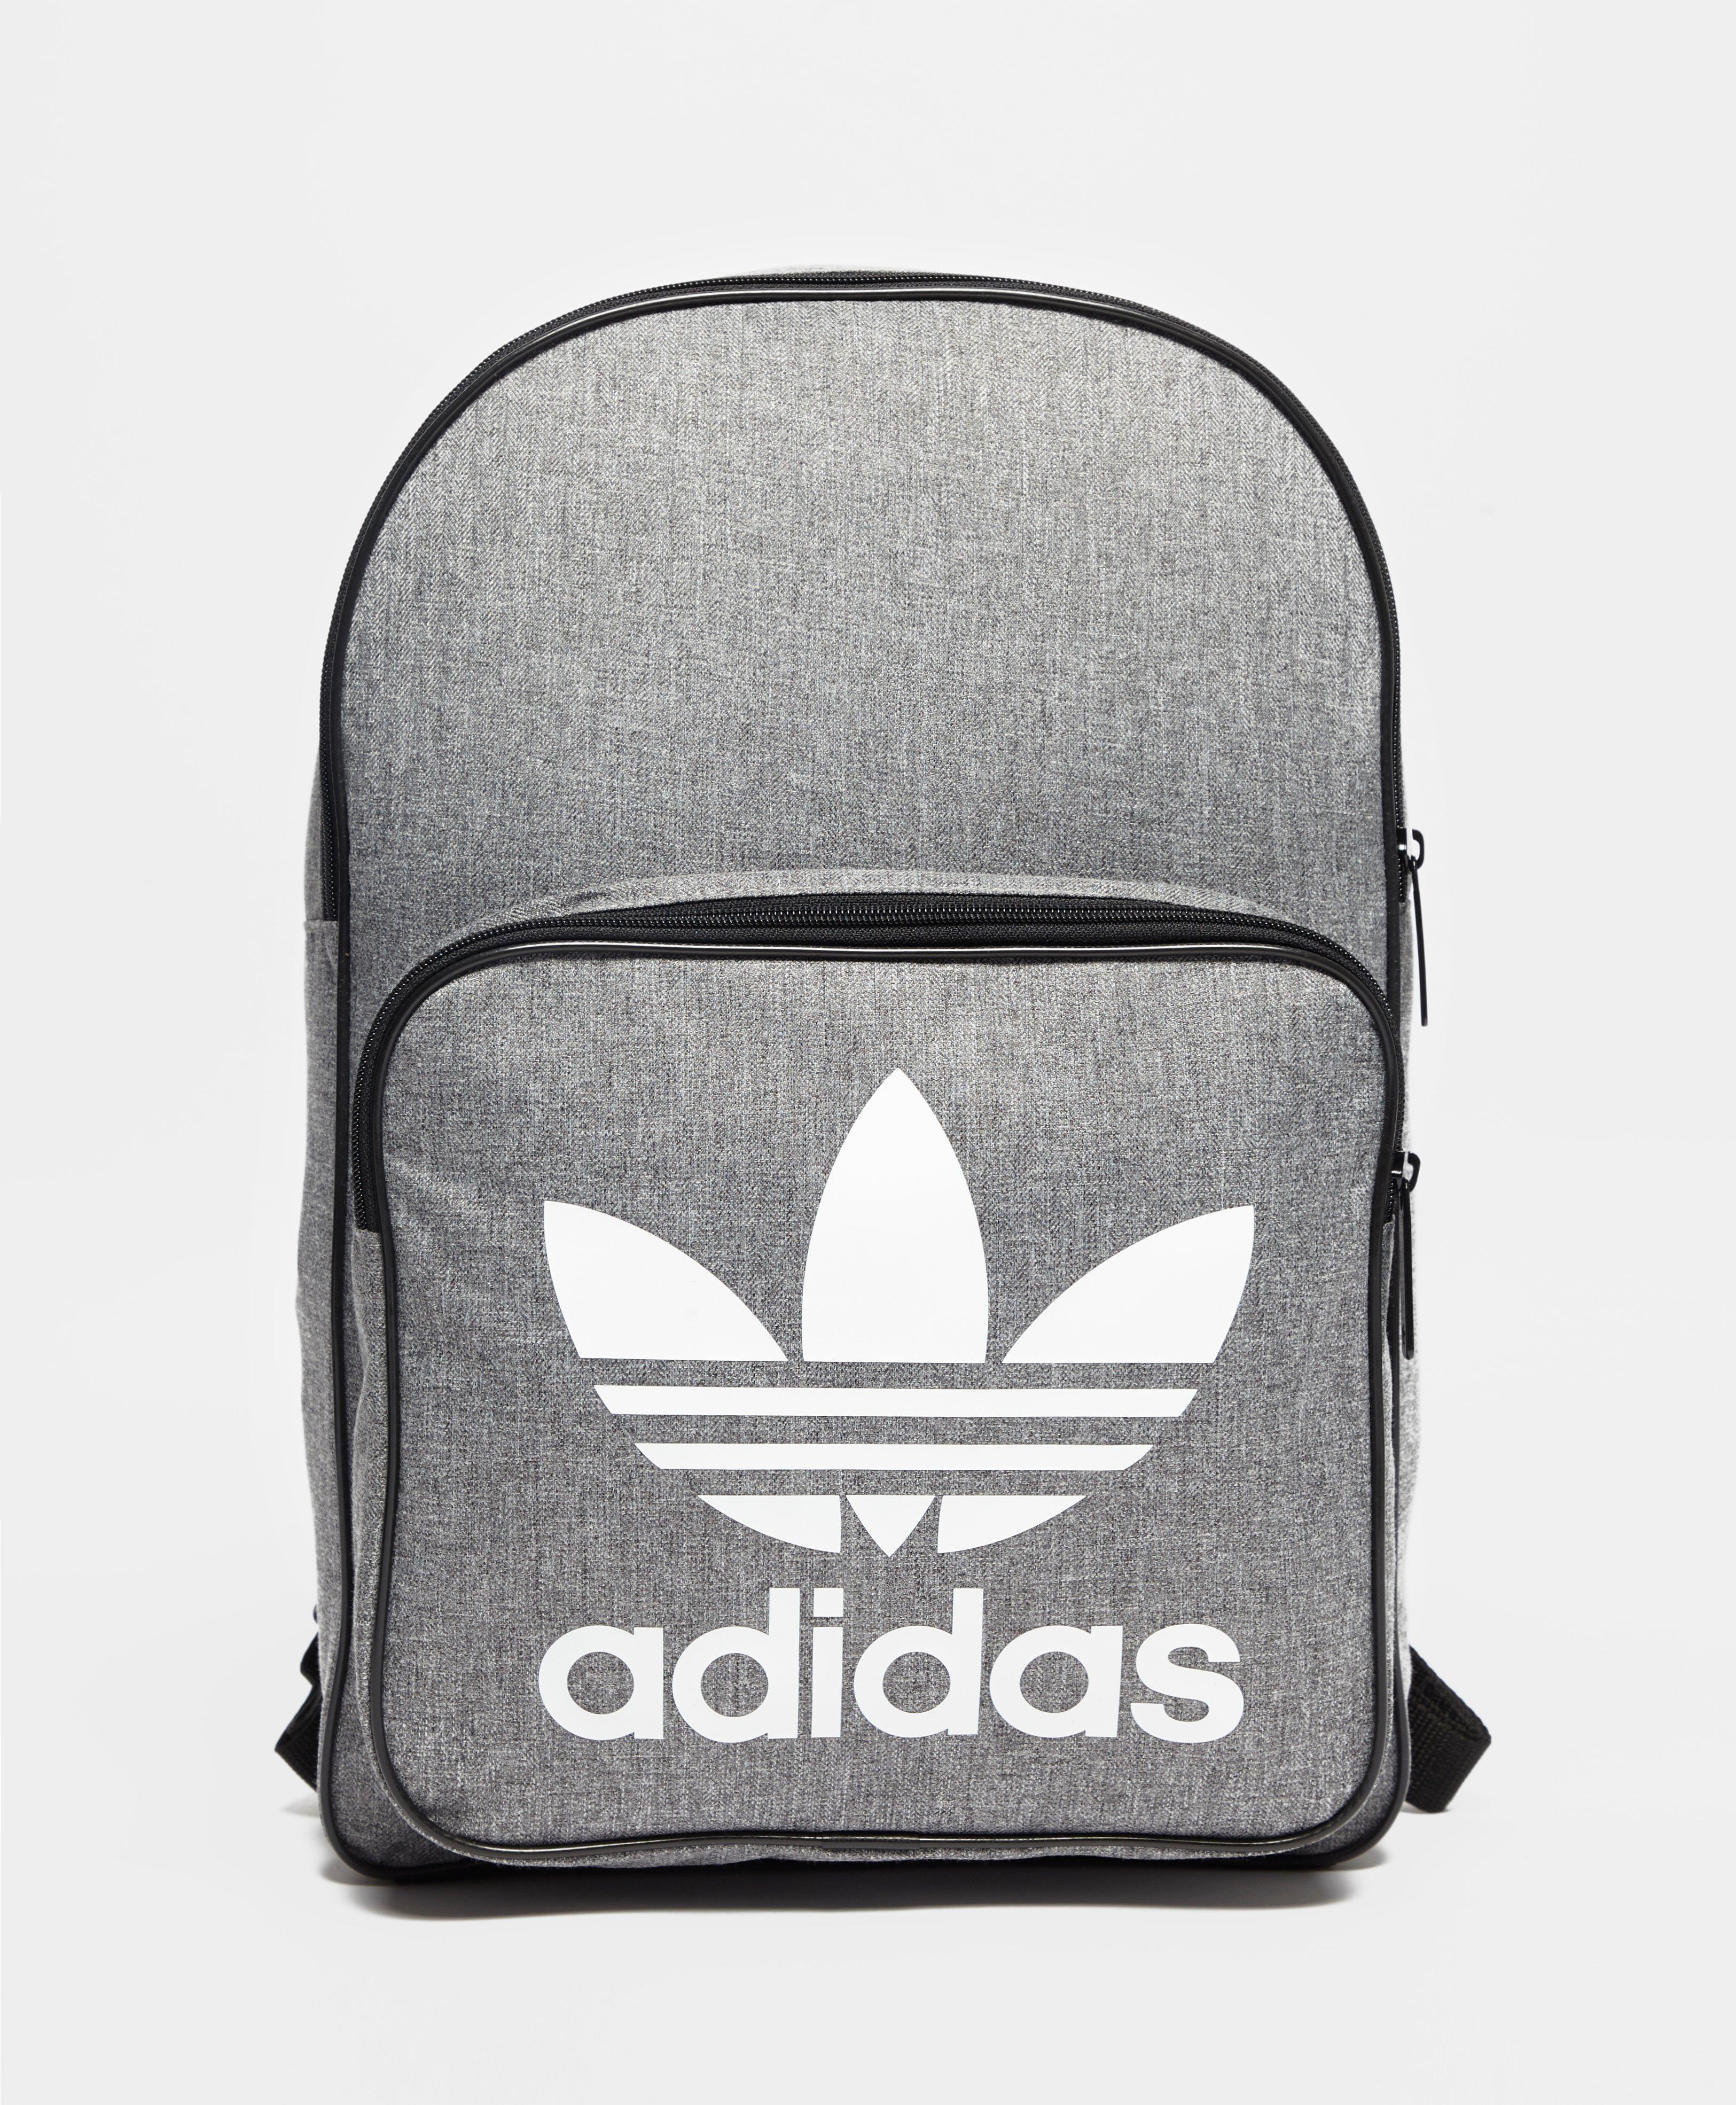 adidas Originals Classic Trefoil Backpack in Gray for Men - Lyst 705e4313d8